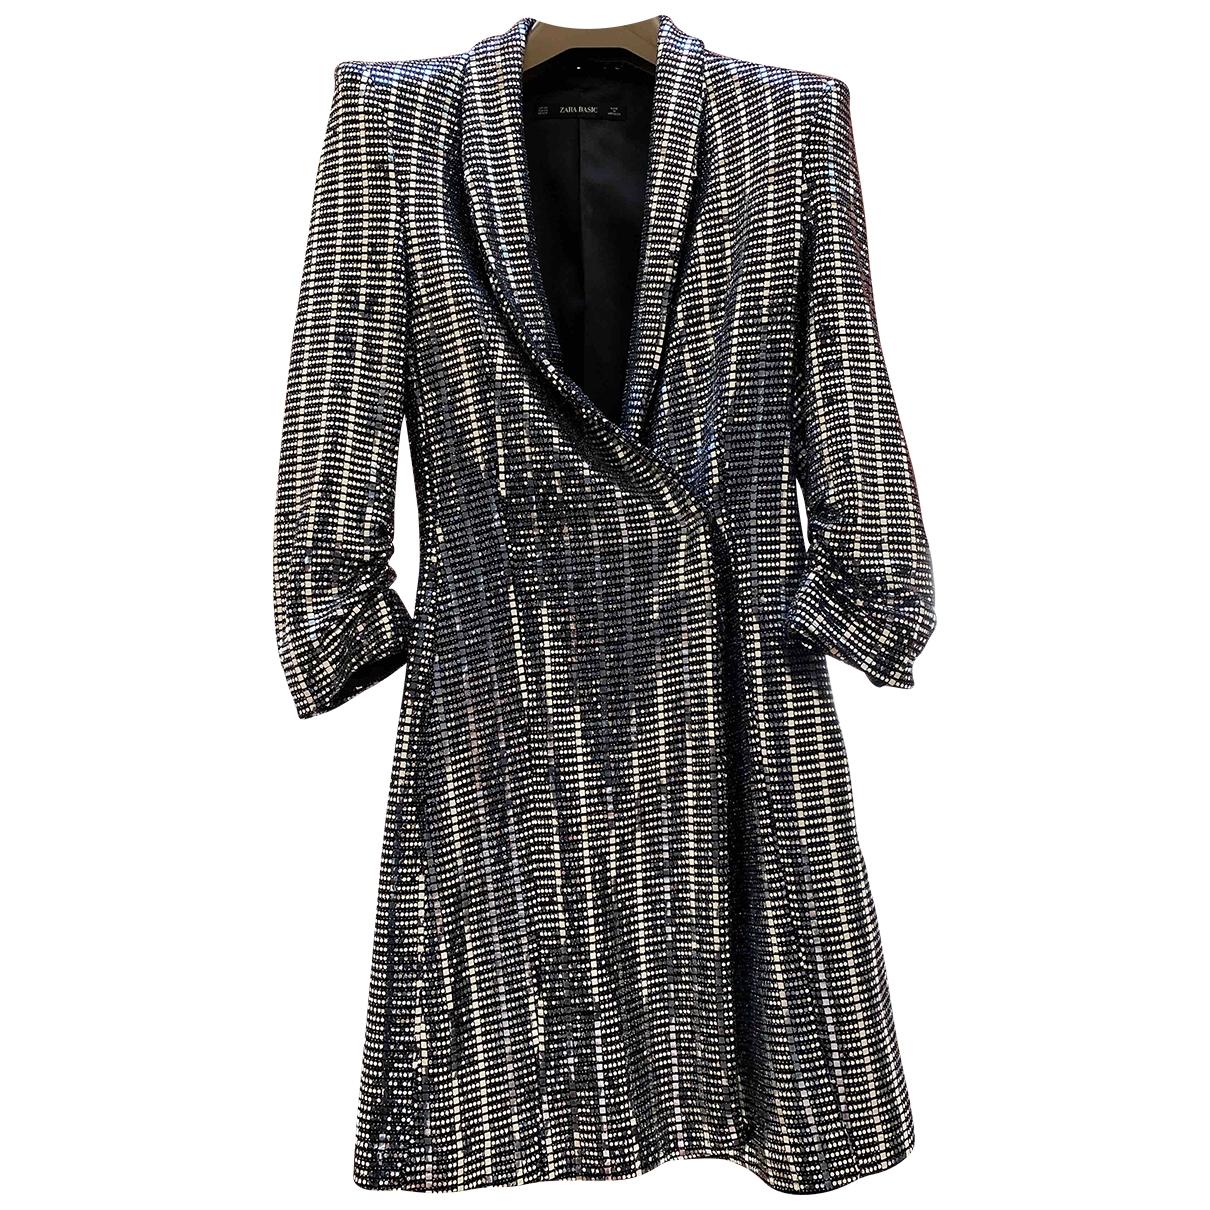 Zara \N Silver Cotton dress for Women XS International